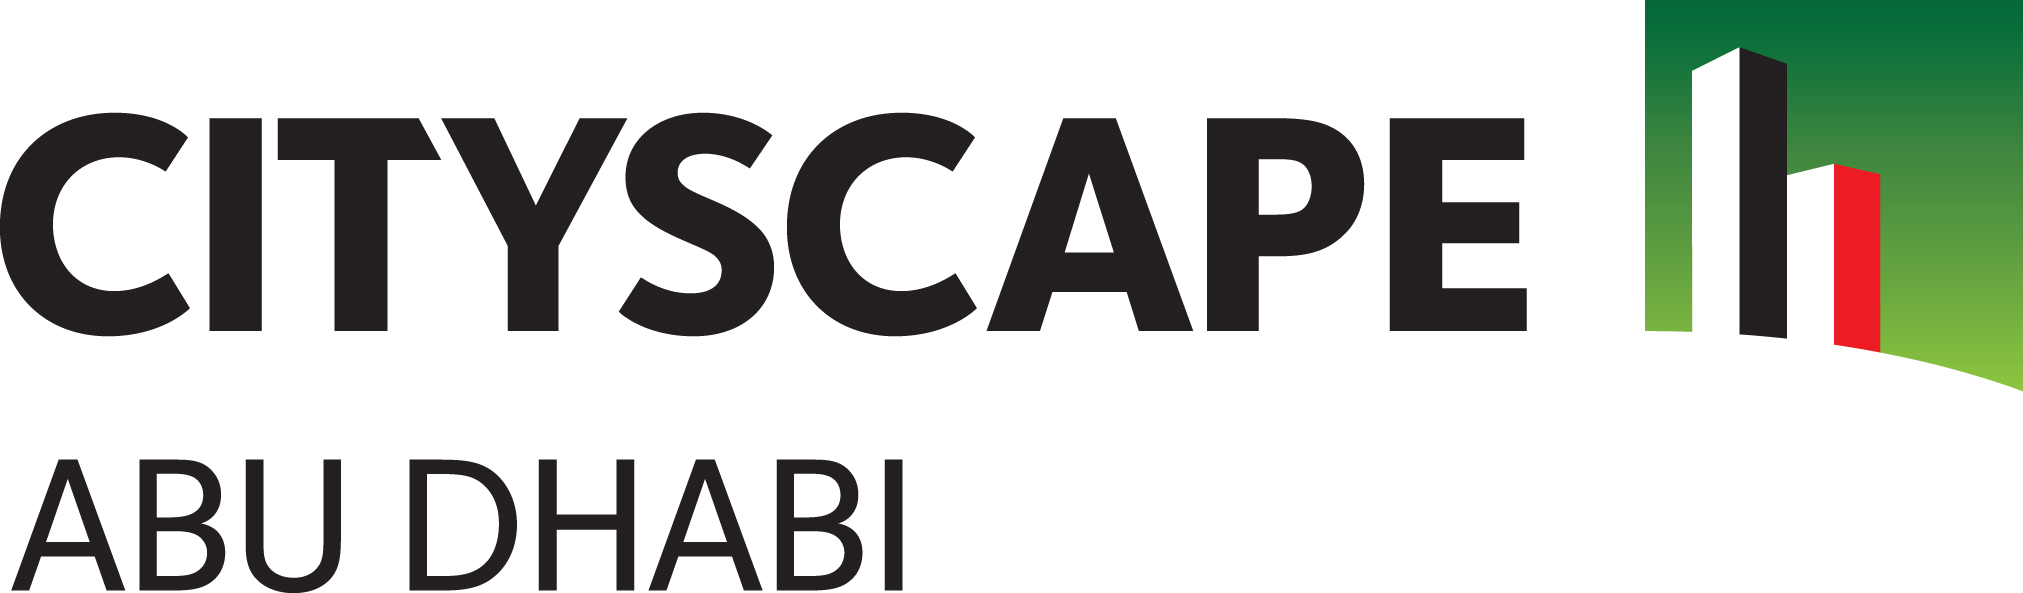 Cityscape Abu Dhabi 2018